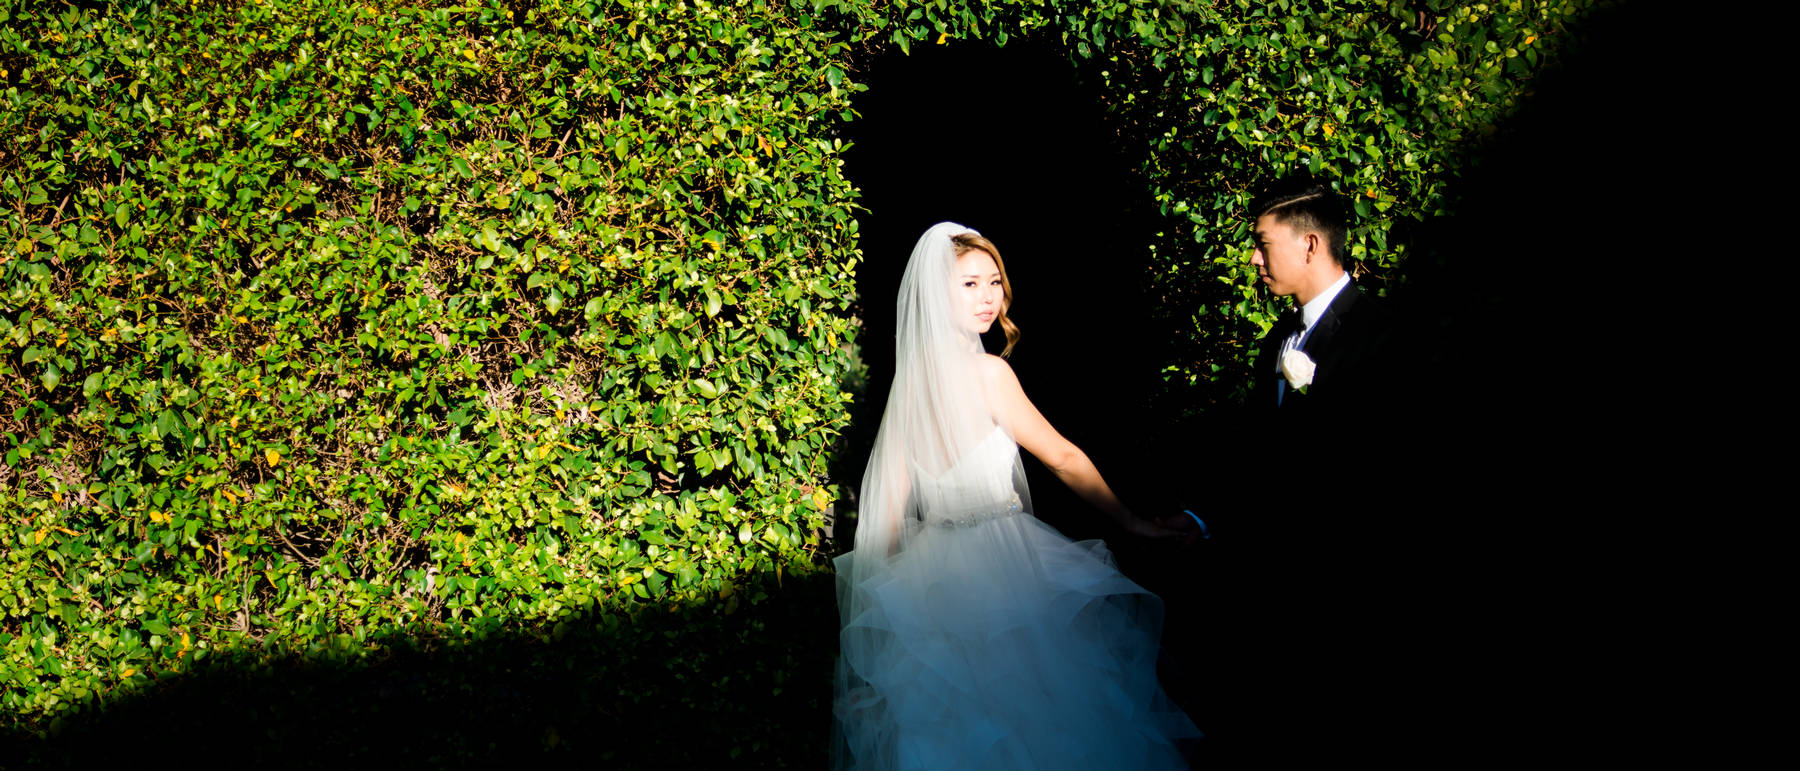 johnandjoseph-wedding-photographer-hz-slider-262